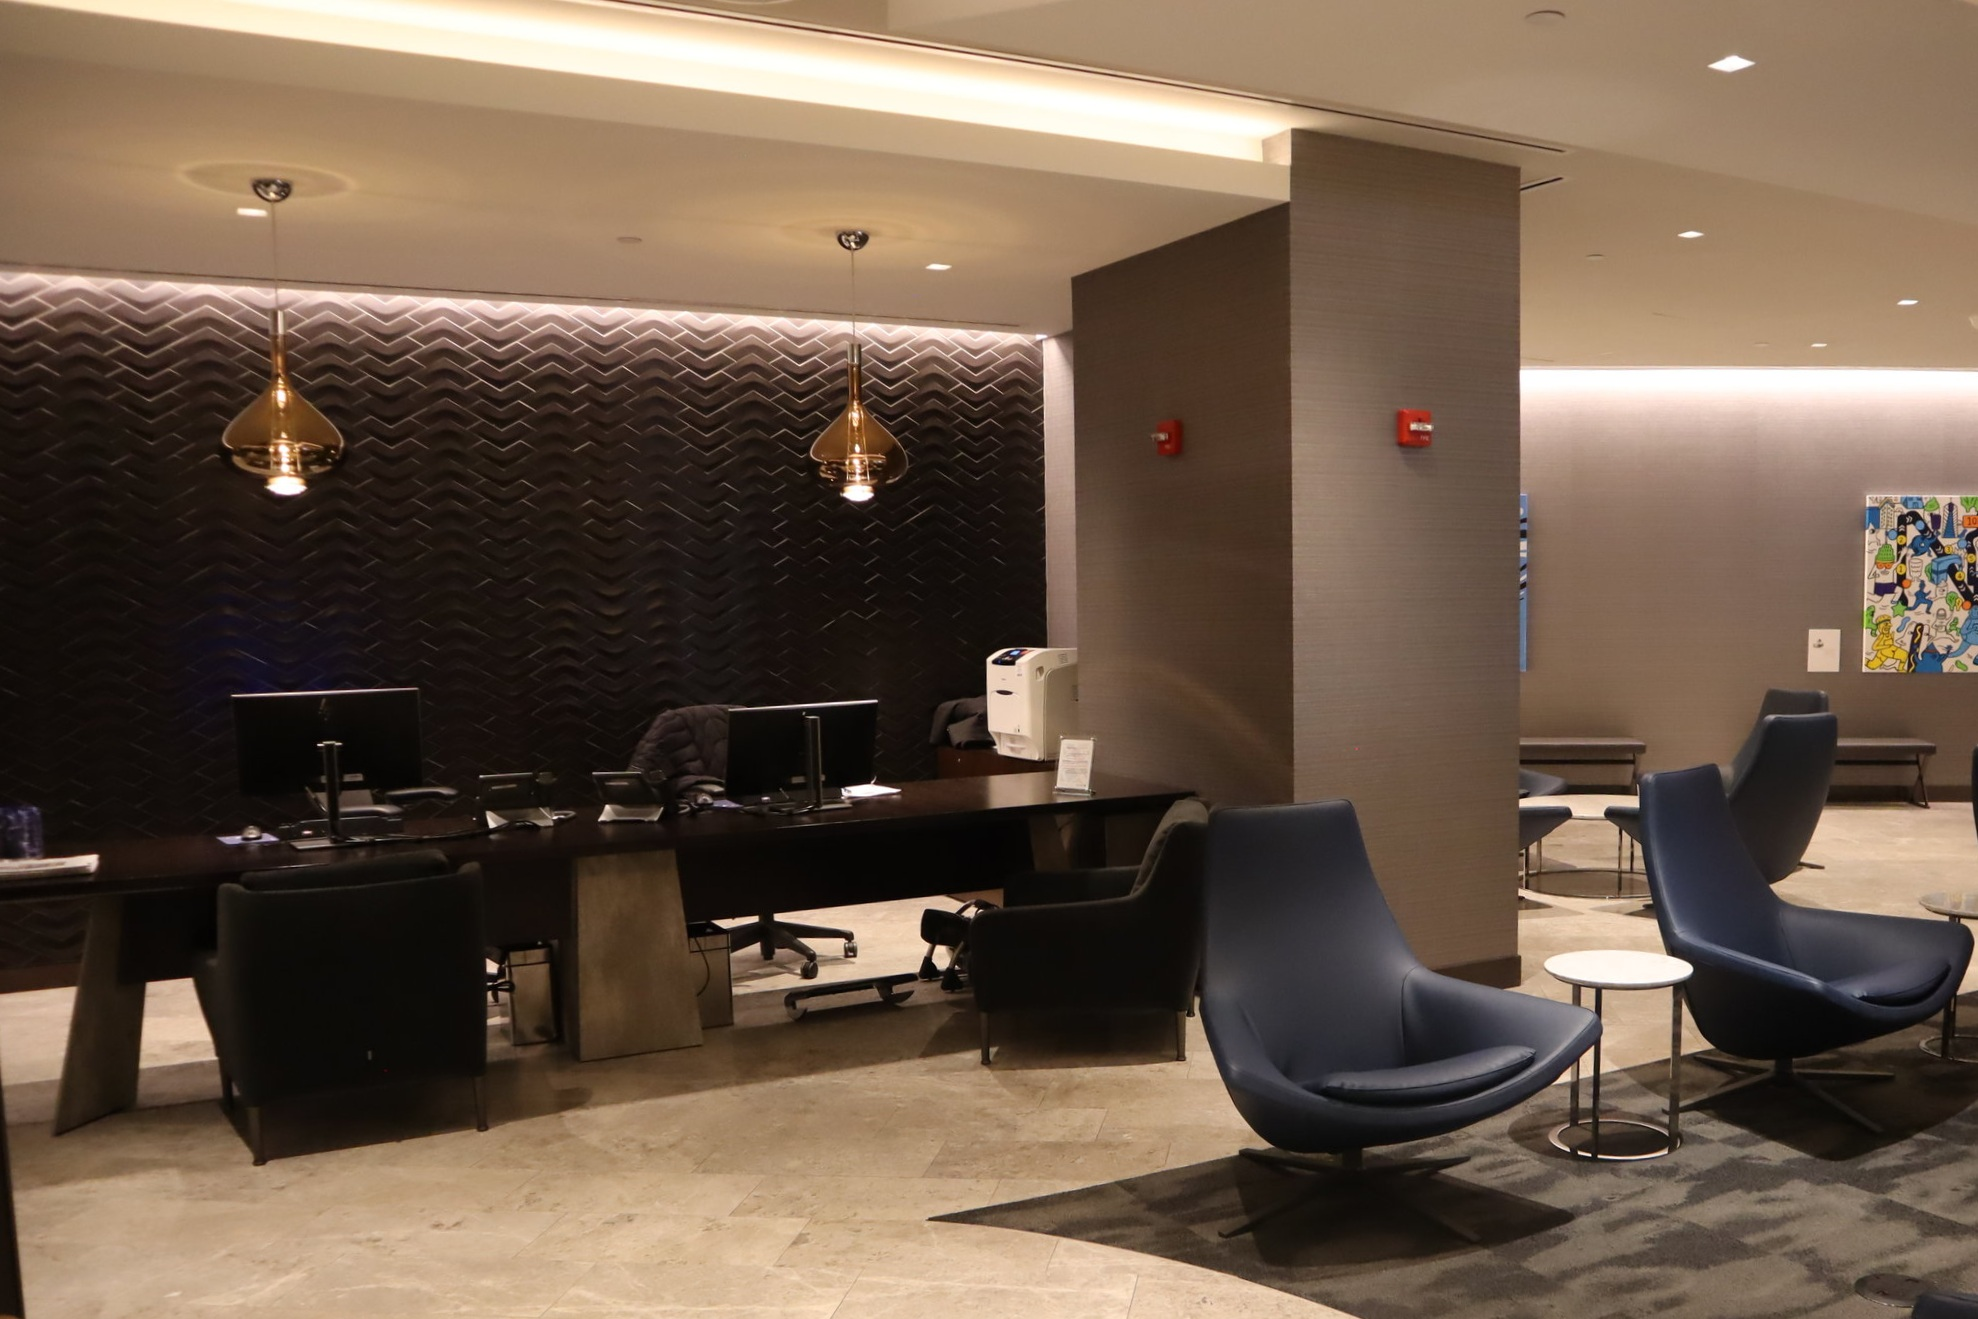 United Polaris Lounge Newark – Concierge desk